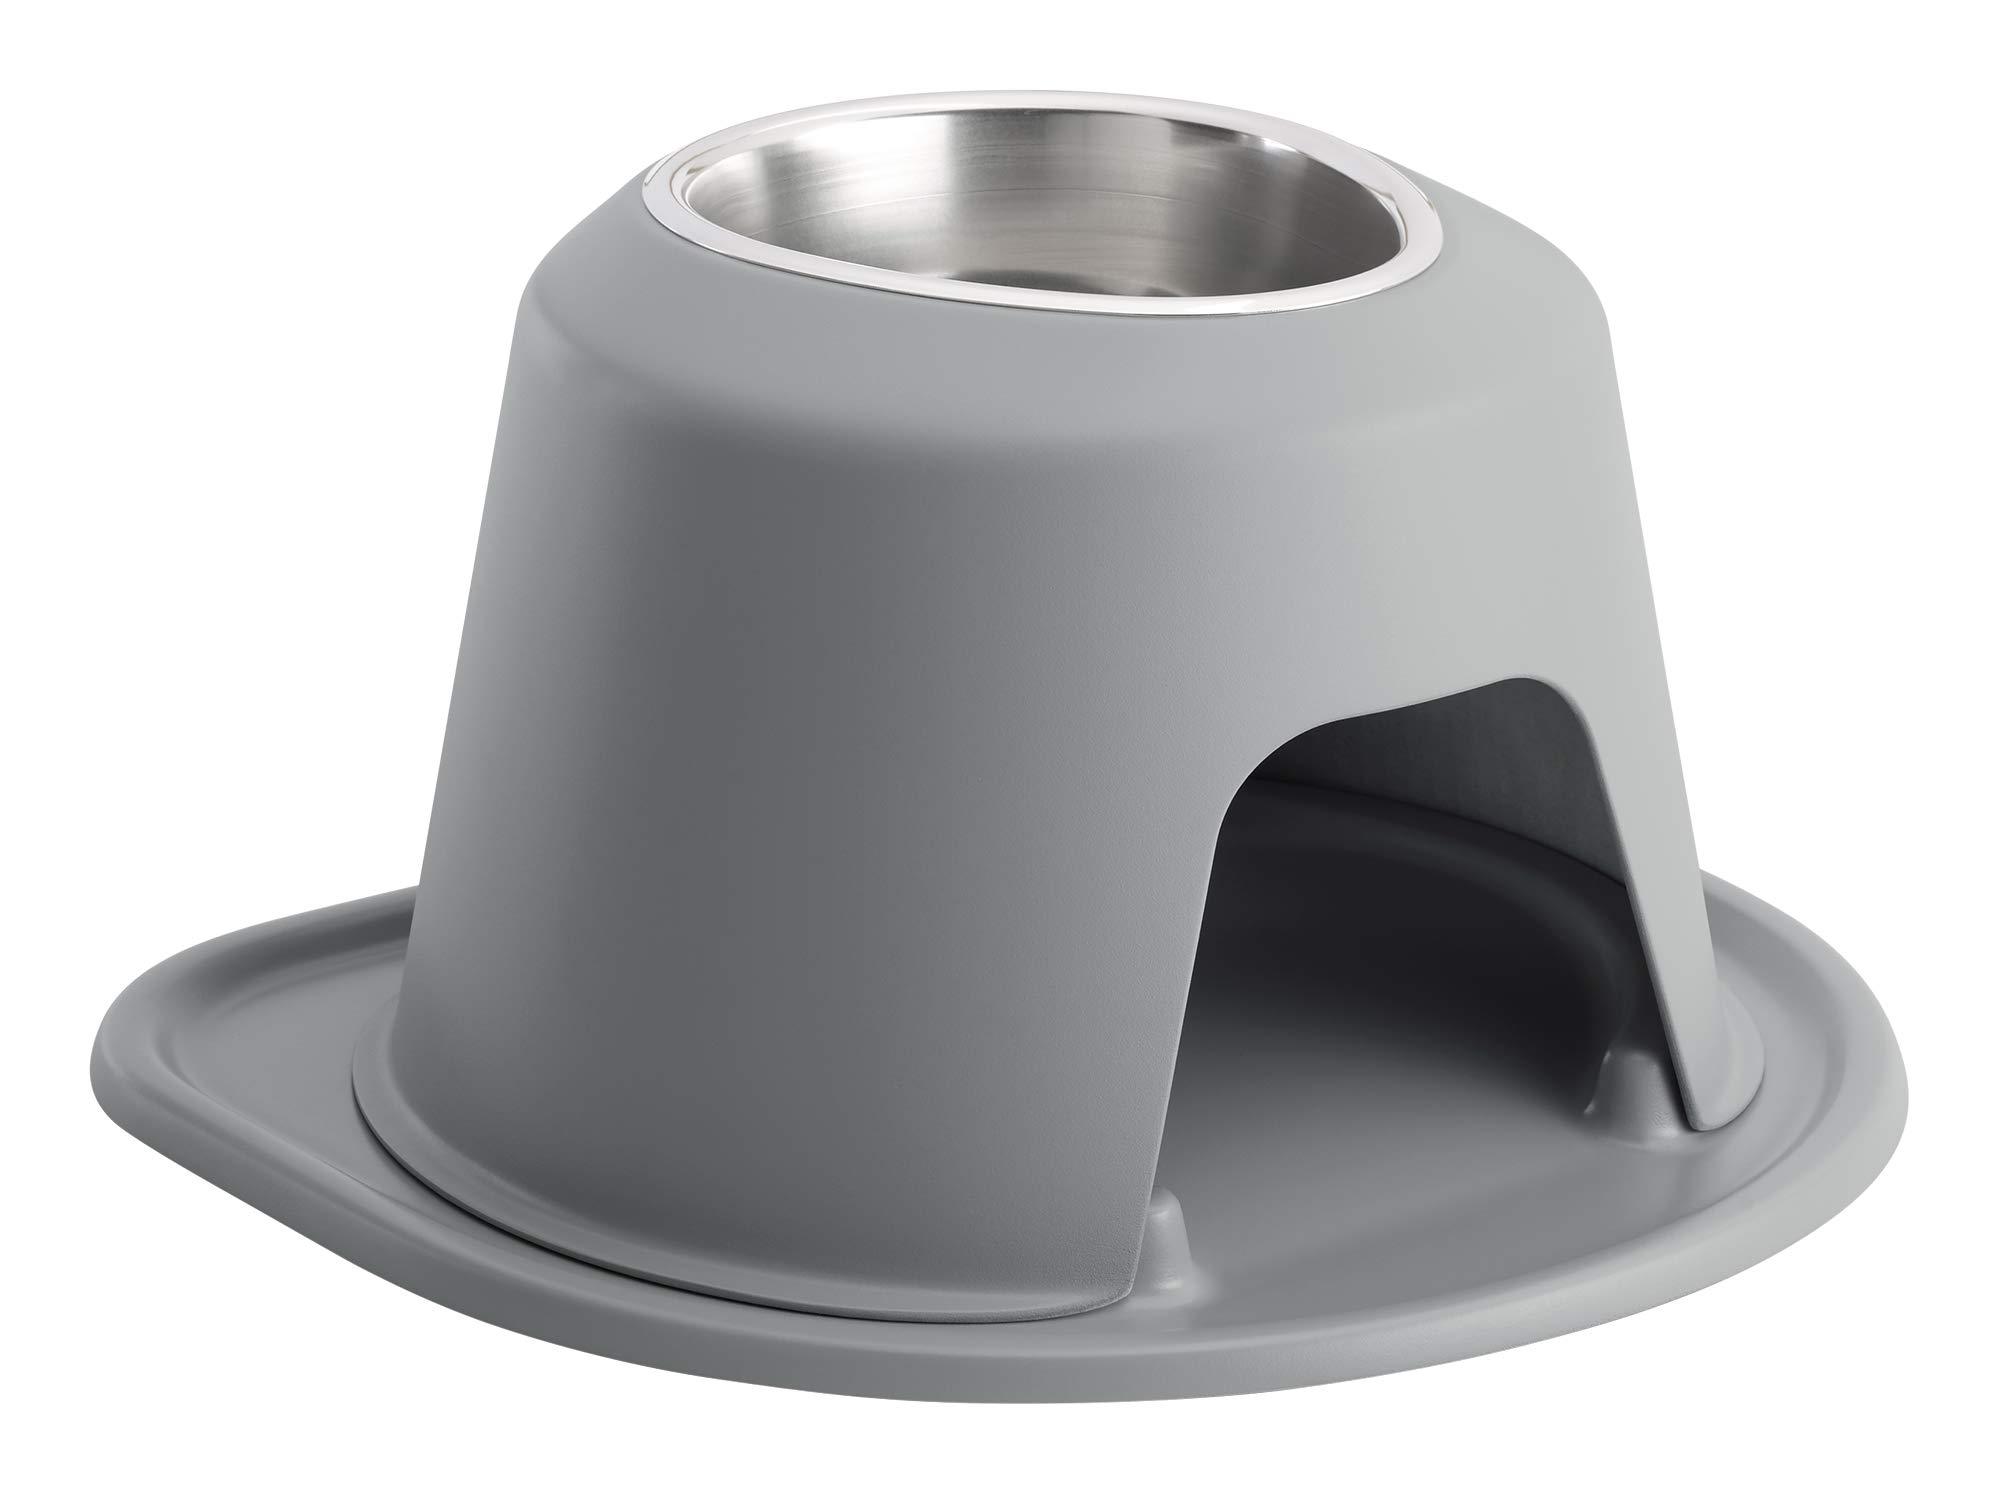 PetComfort Single High Feeding System with Standard Mat (8 inch, Dark Grey)